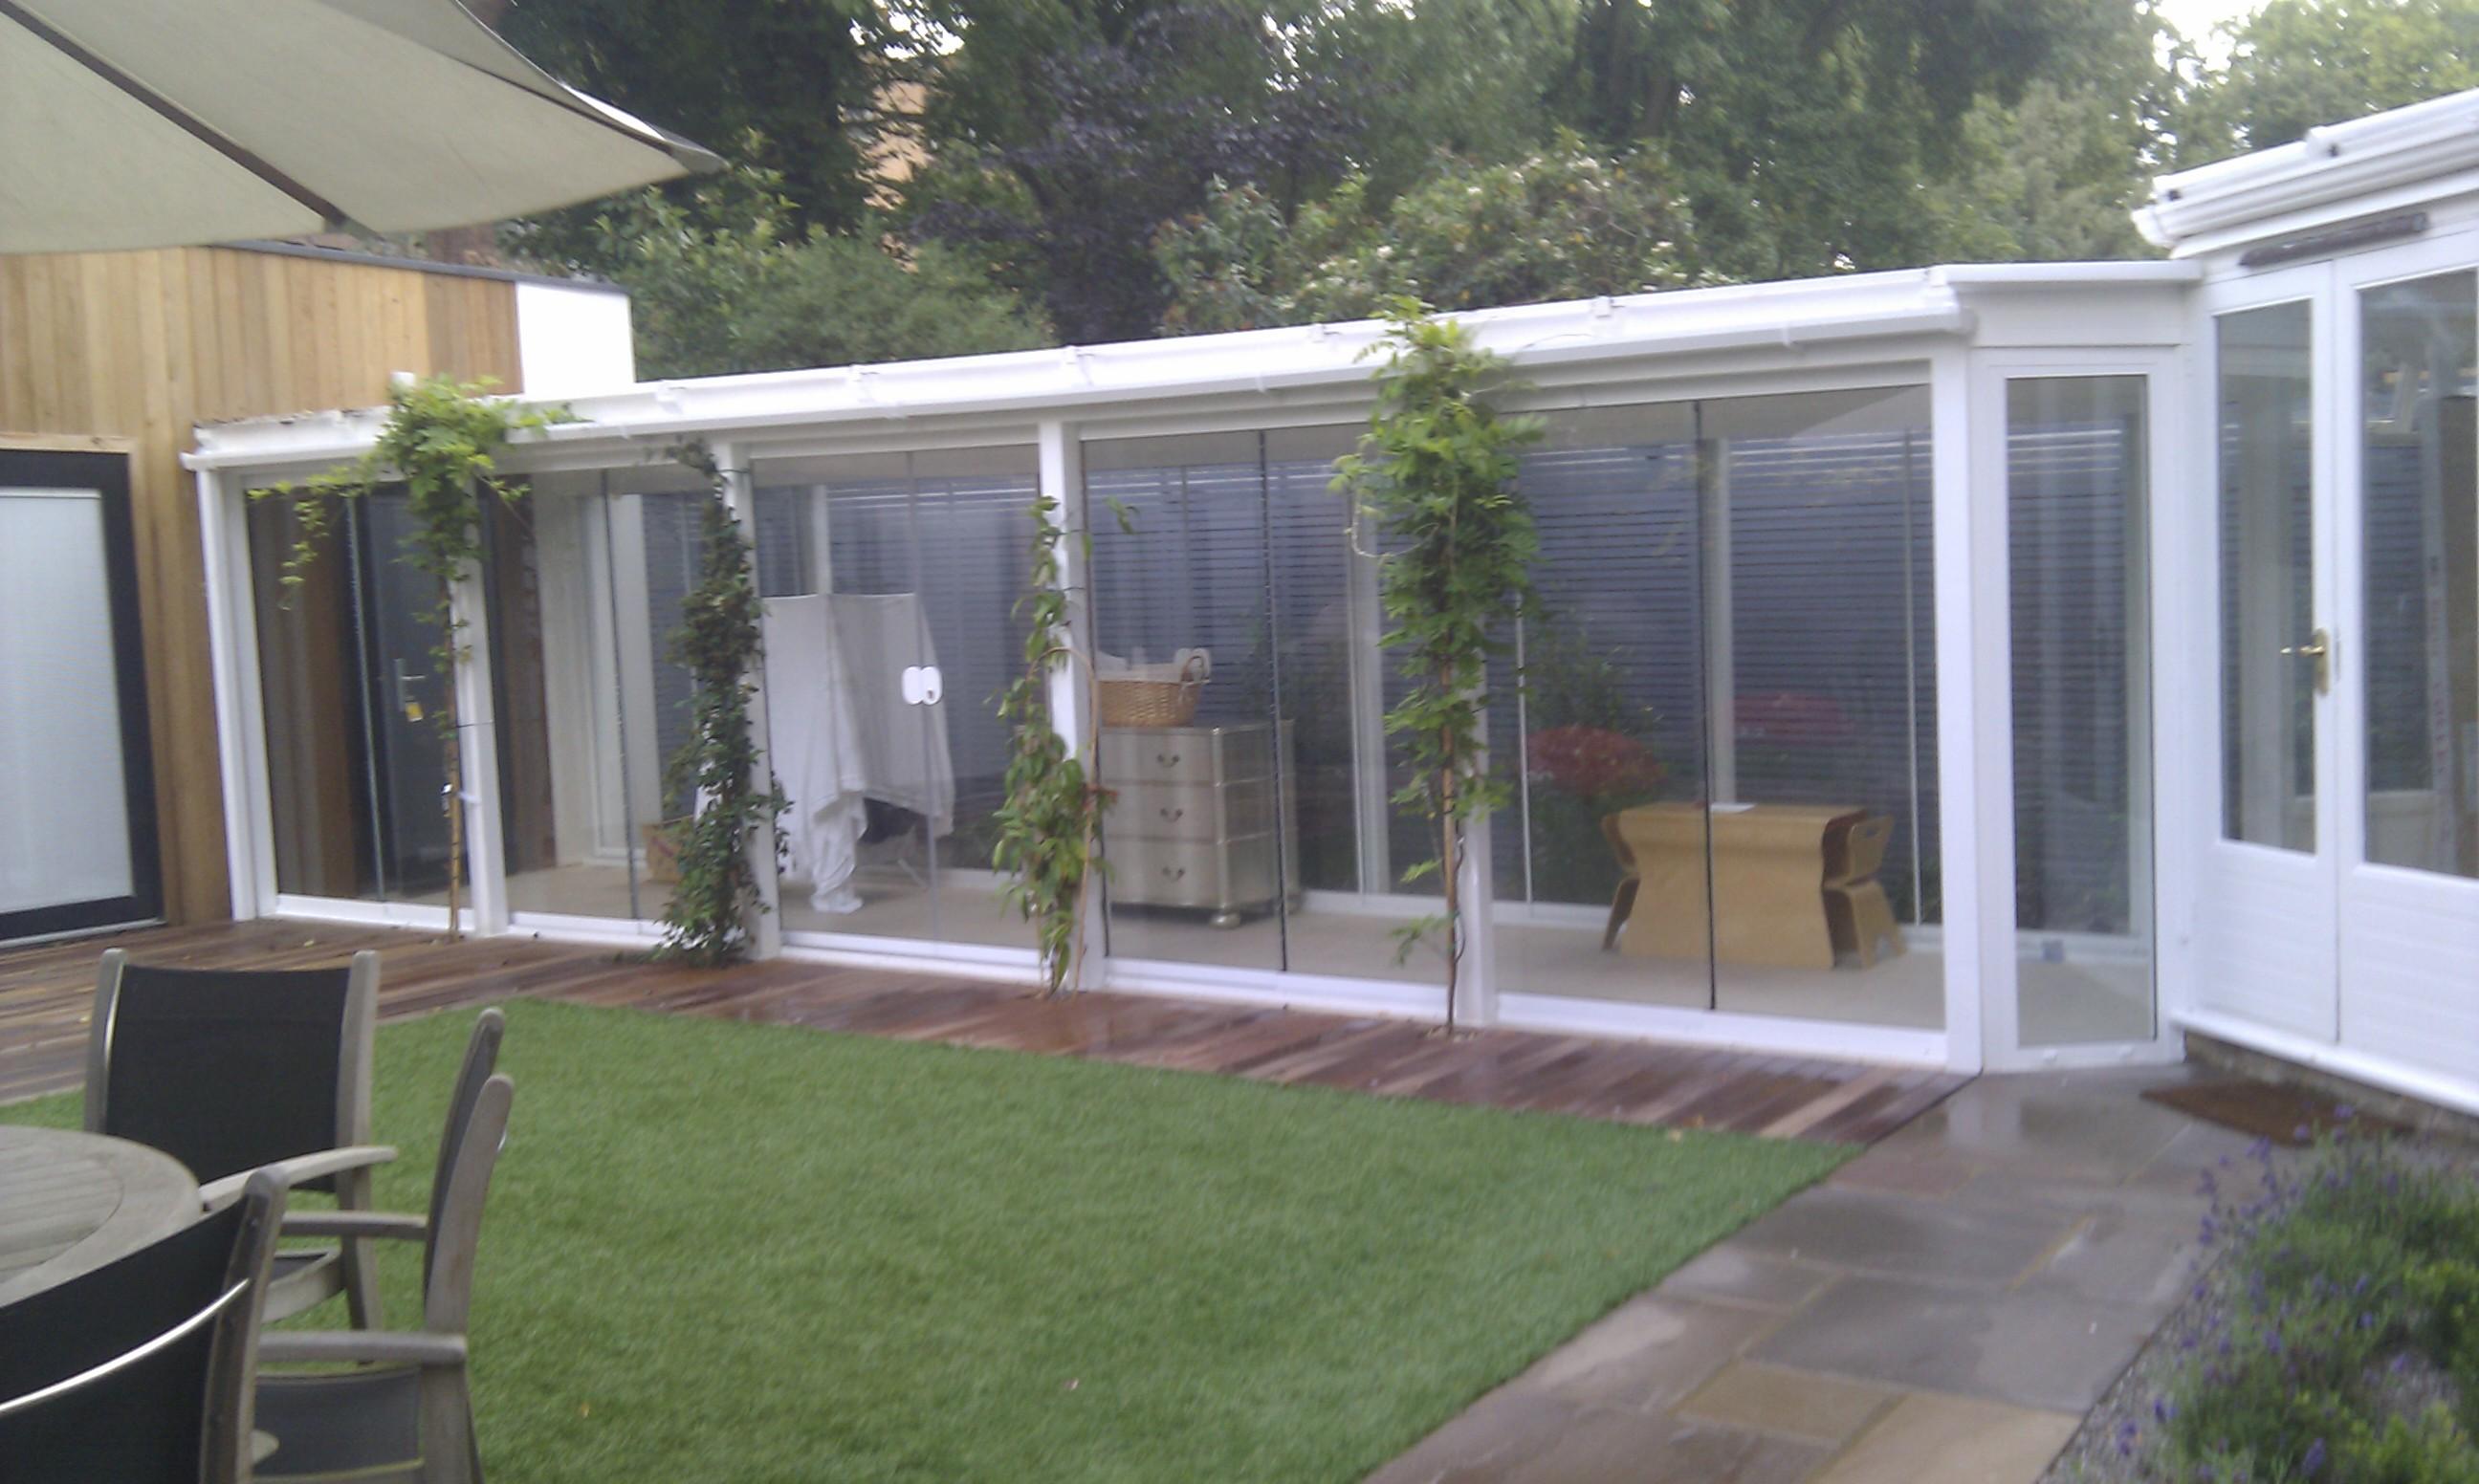 modern garden design london slatted grey privacy screen sandstone paving easy grass balau hardwood decking (40)